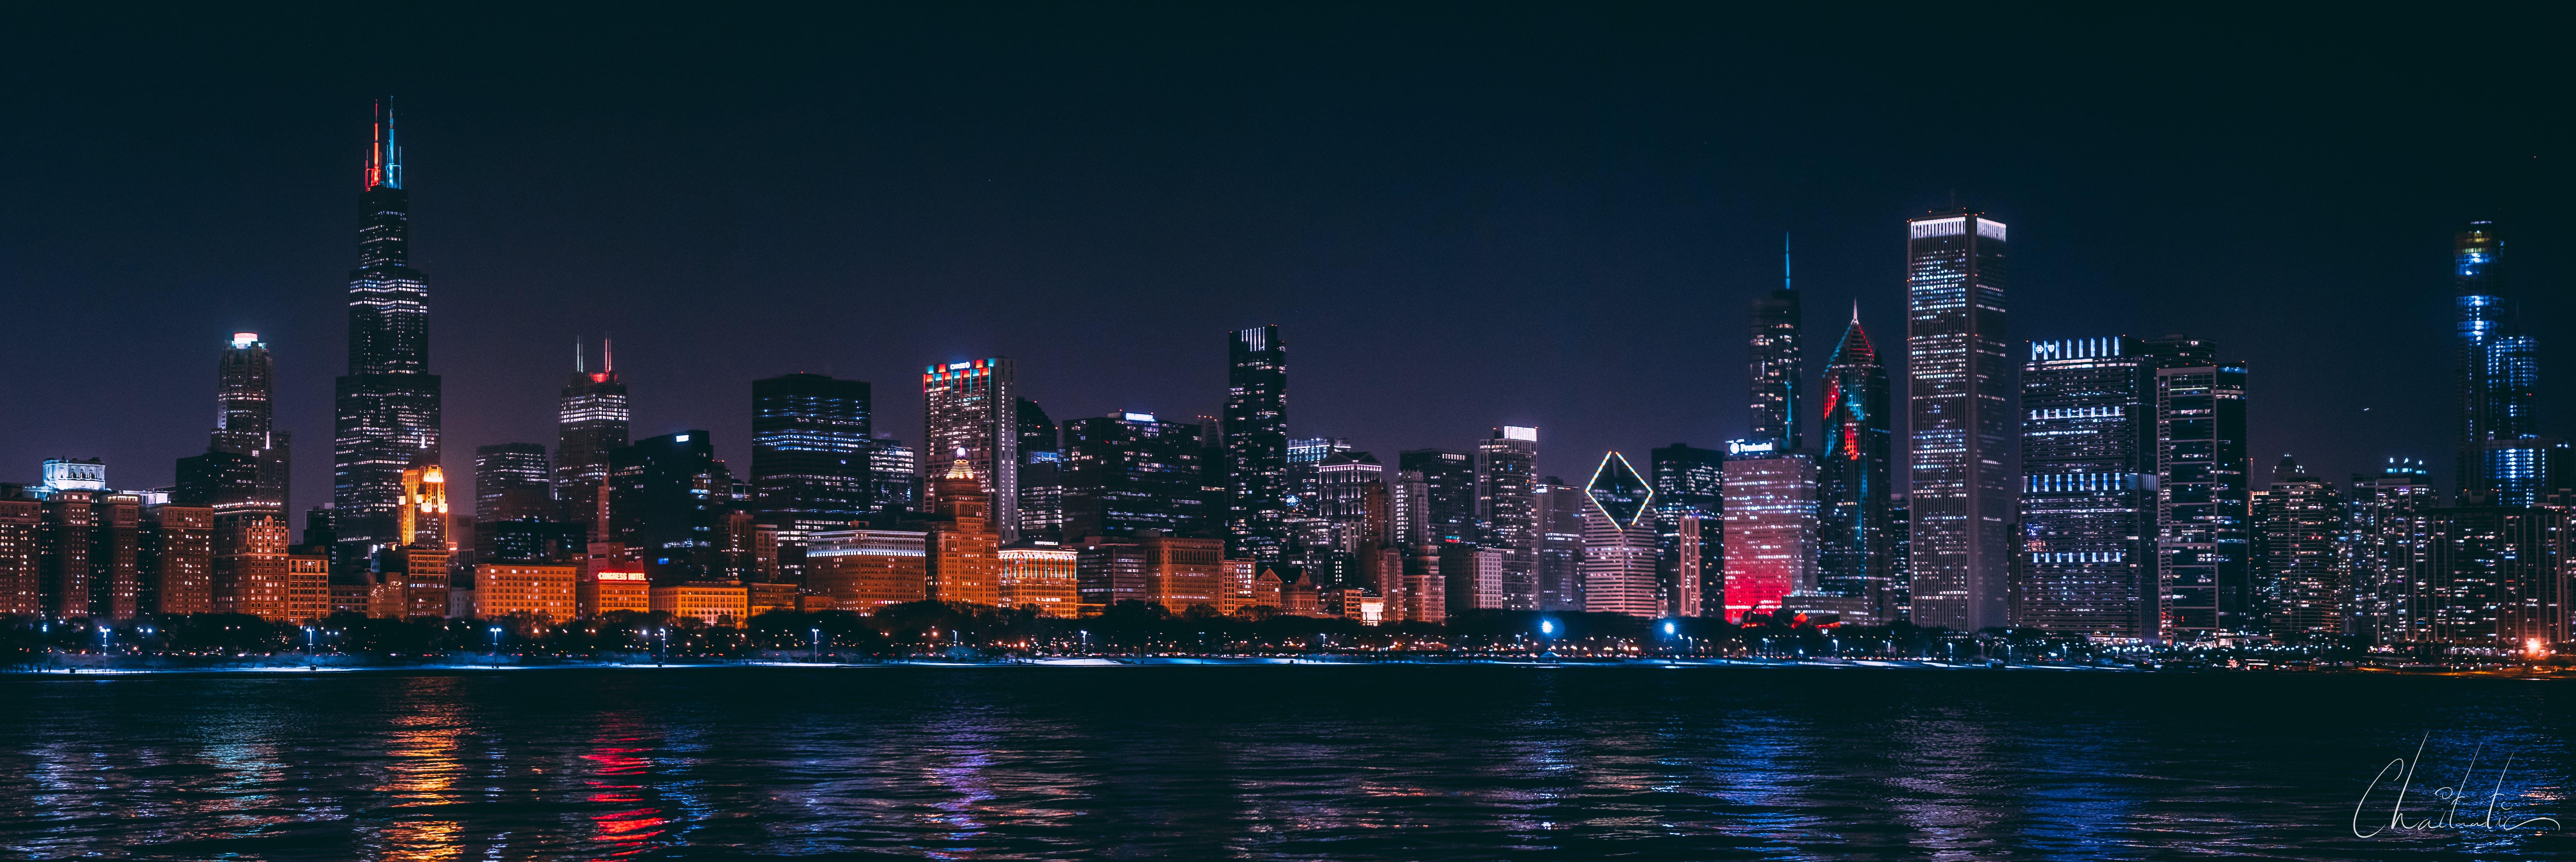 Kostenloses Stock Foto zu chicago, panaroma, skline